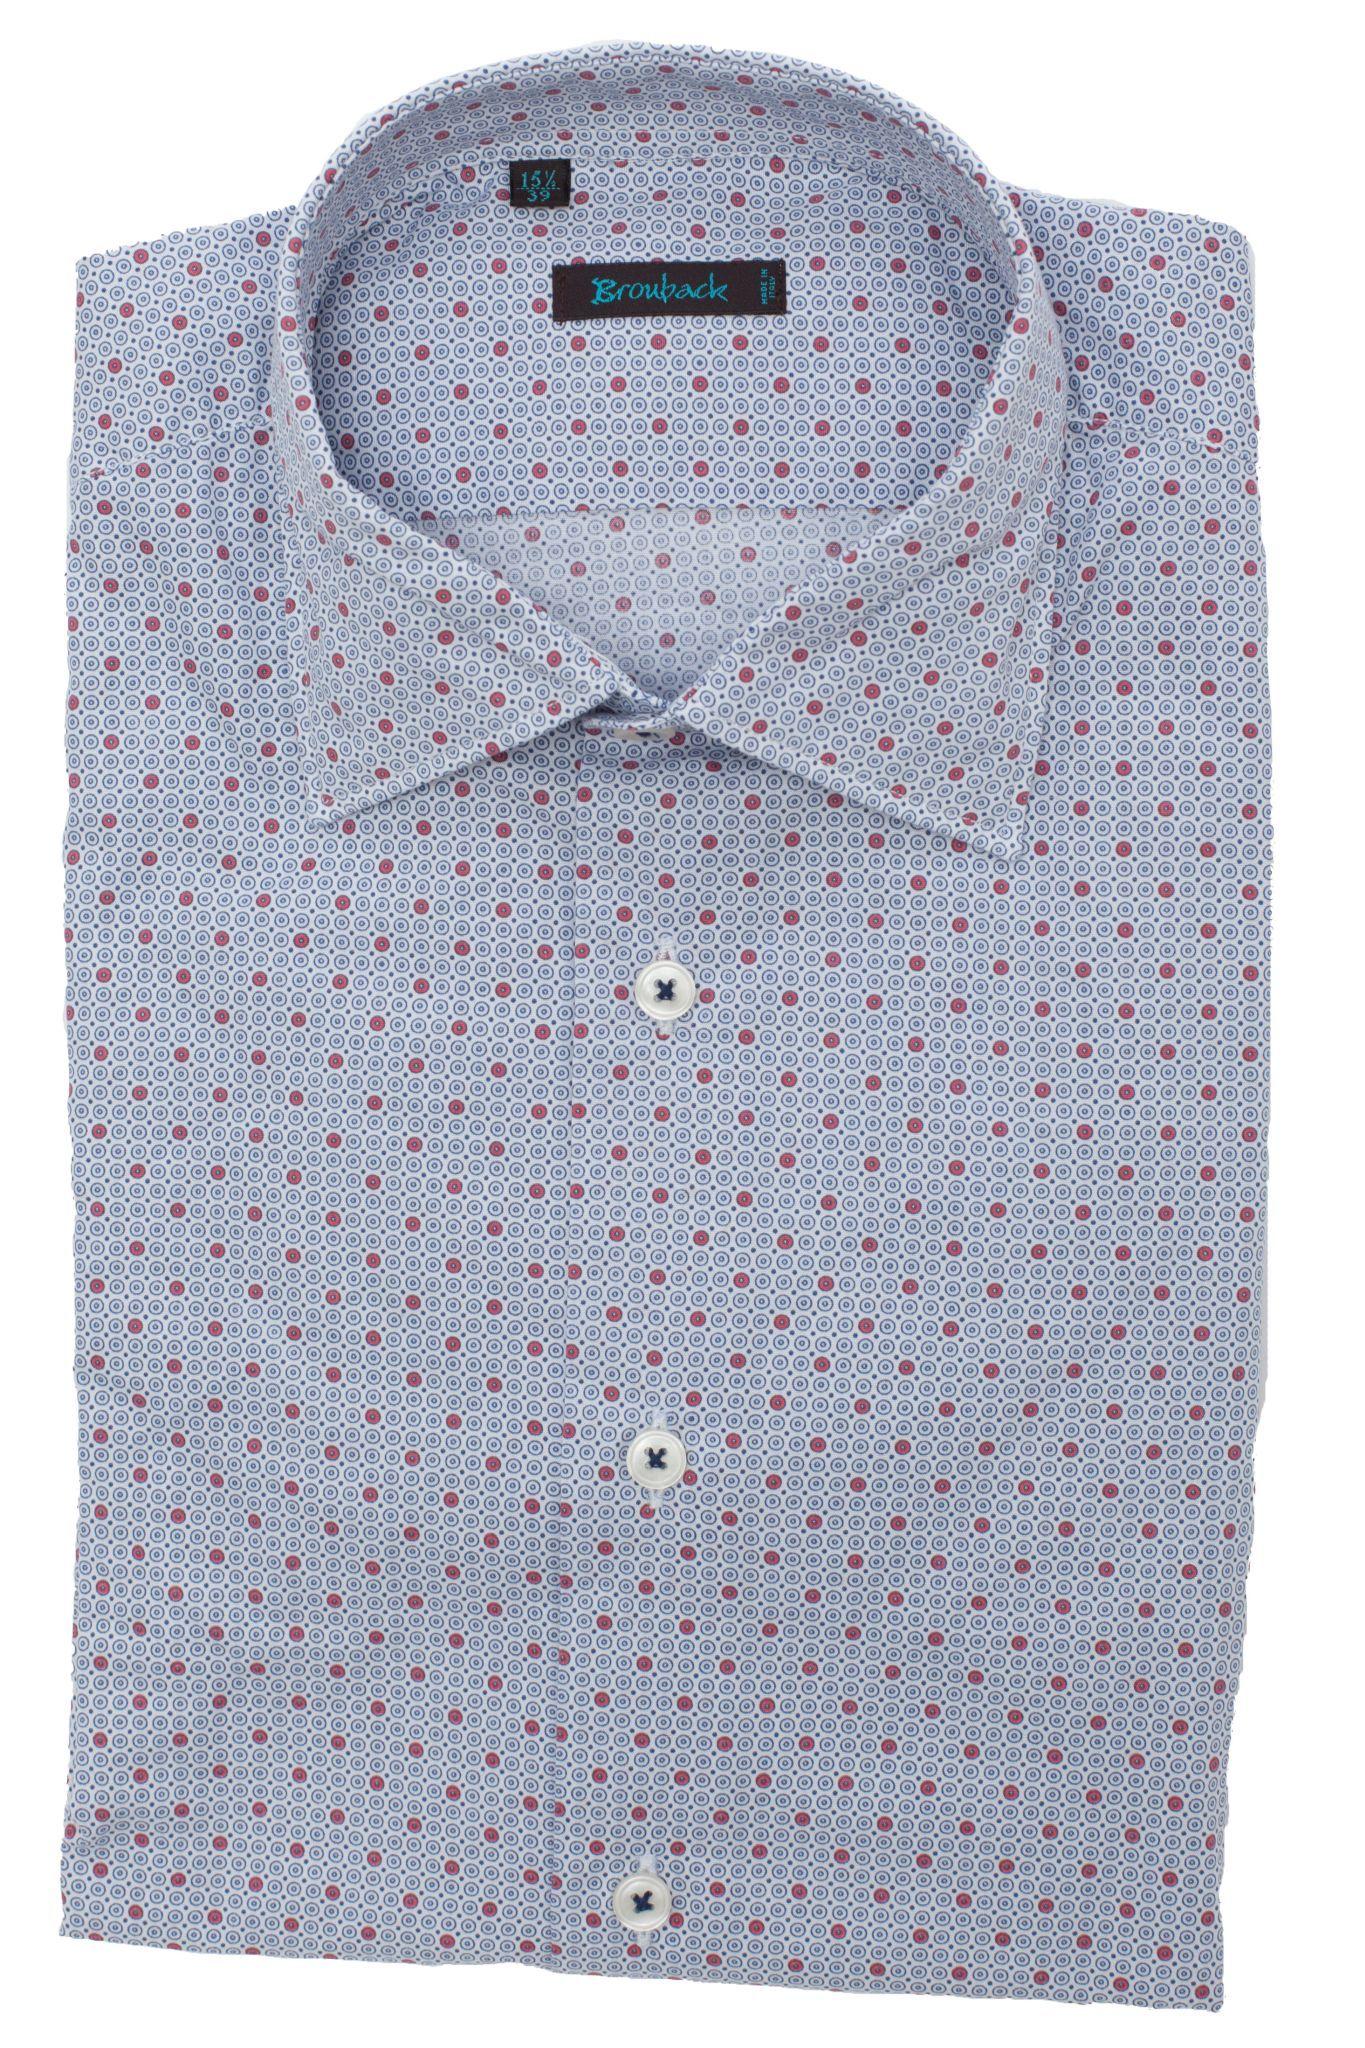 Светло-голубая рубашка с красно-белым геометрическим узором